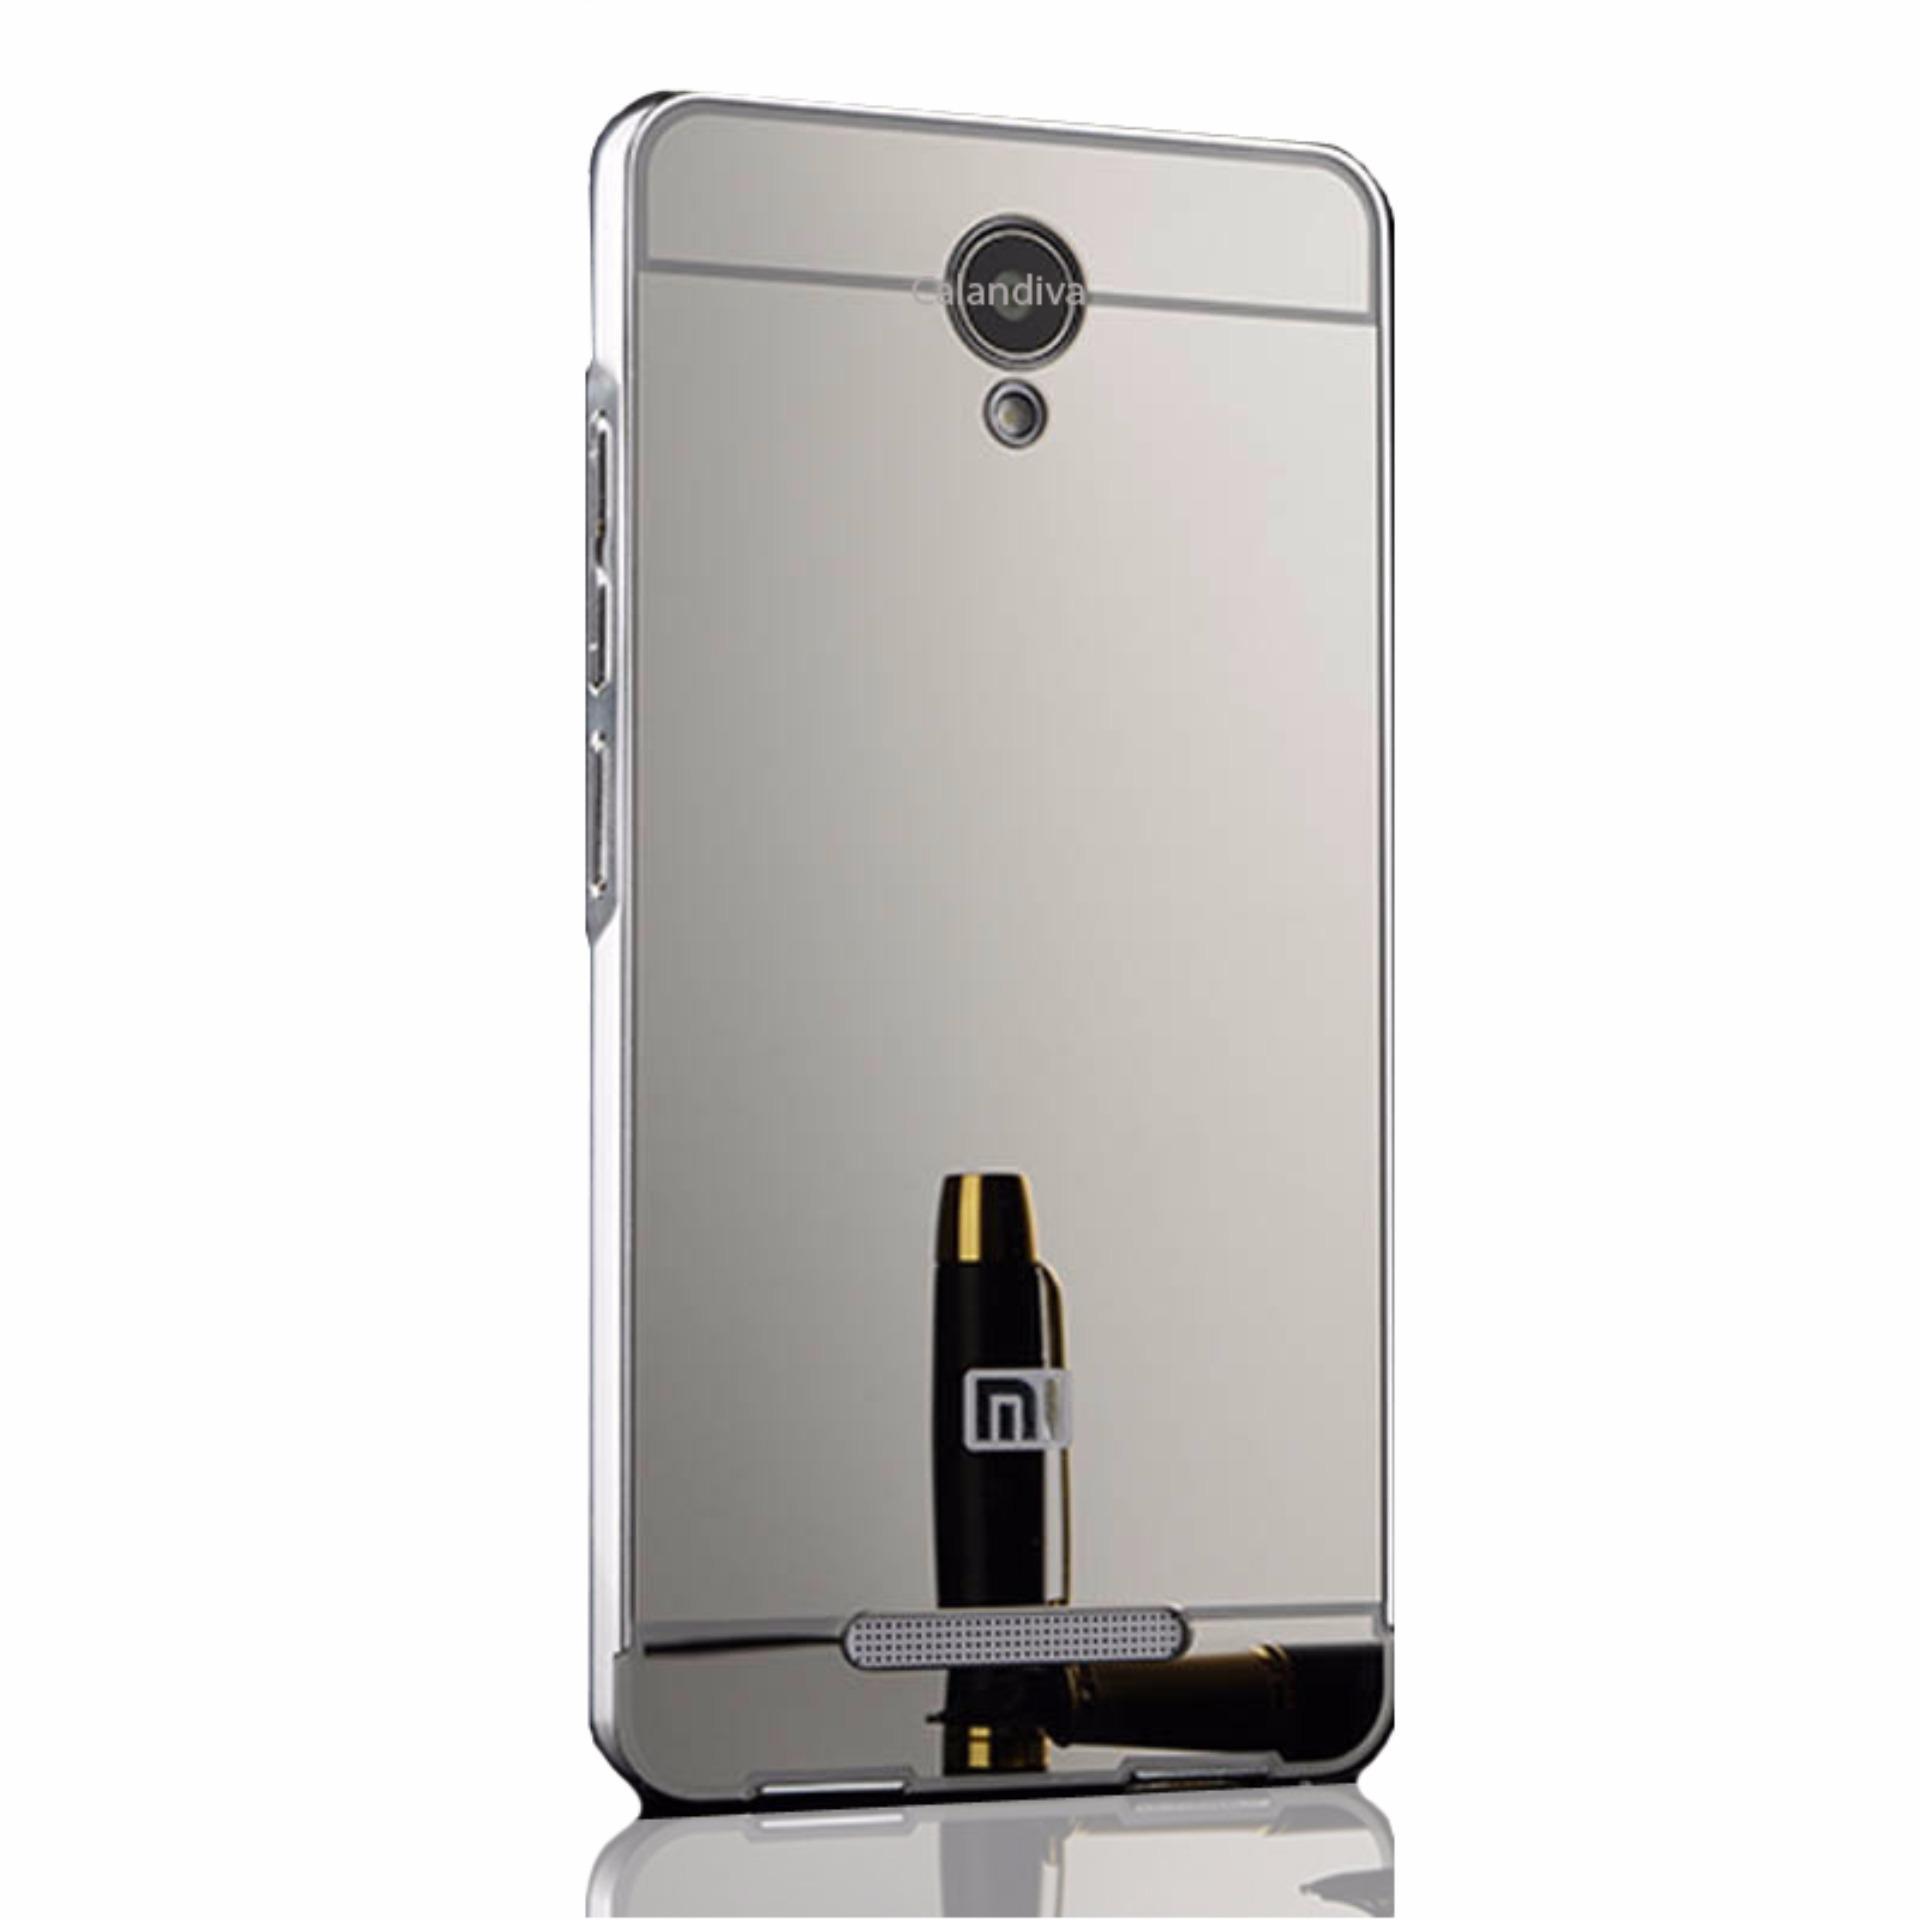 Calandiva Xiaomi Redmi Note 2 Mirror Backcase with Metal Bumper - Silver